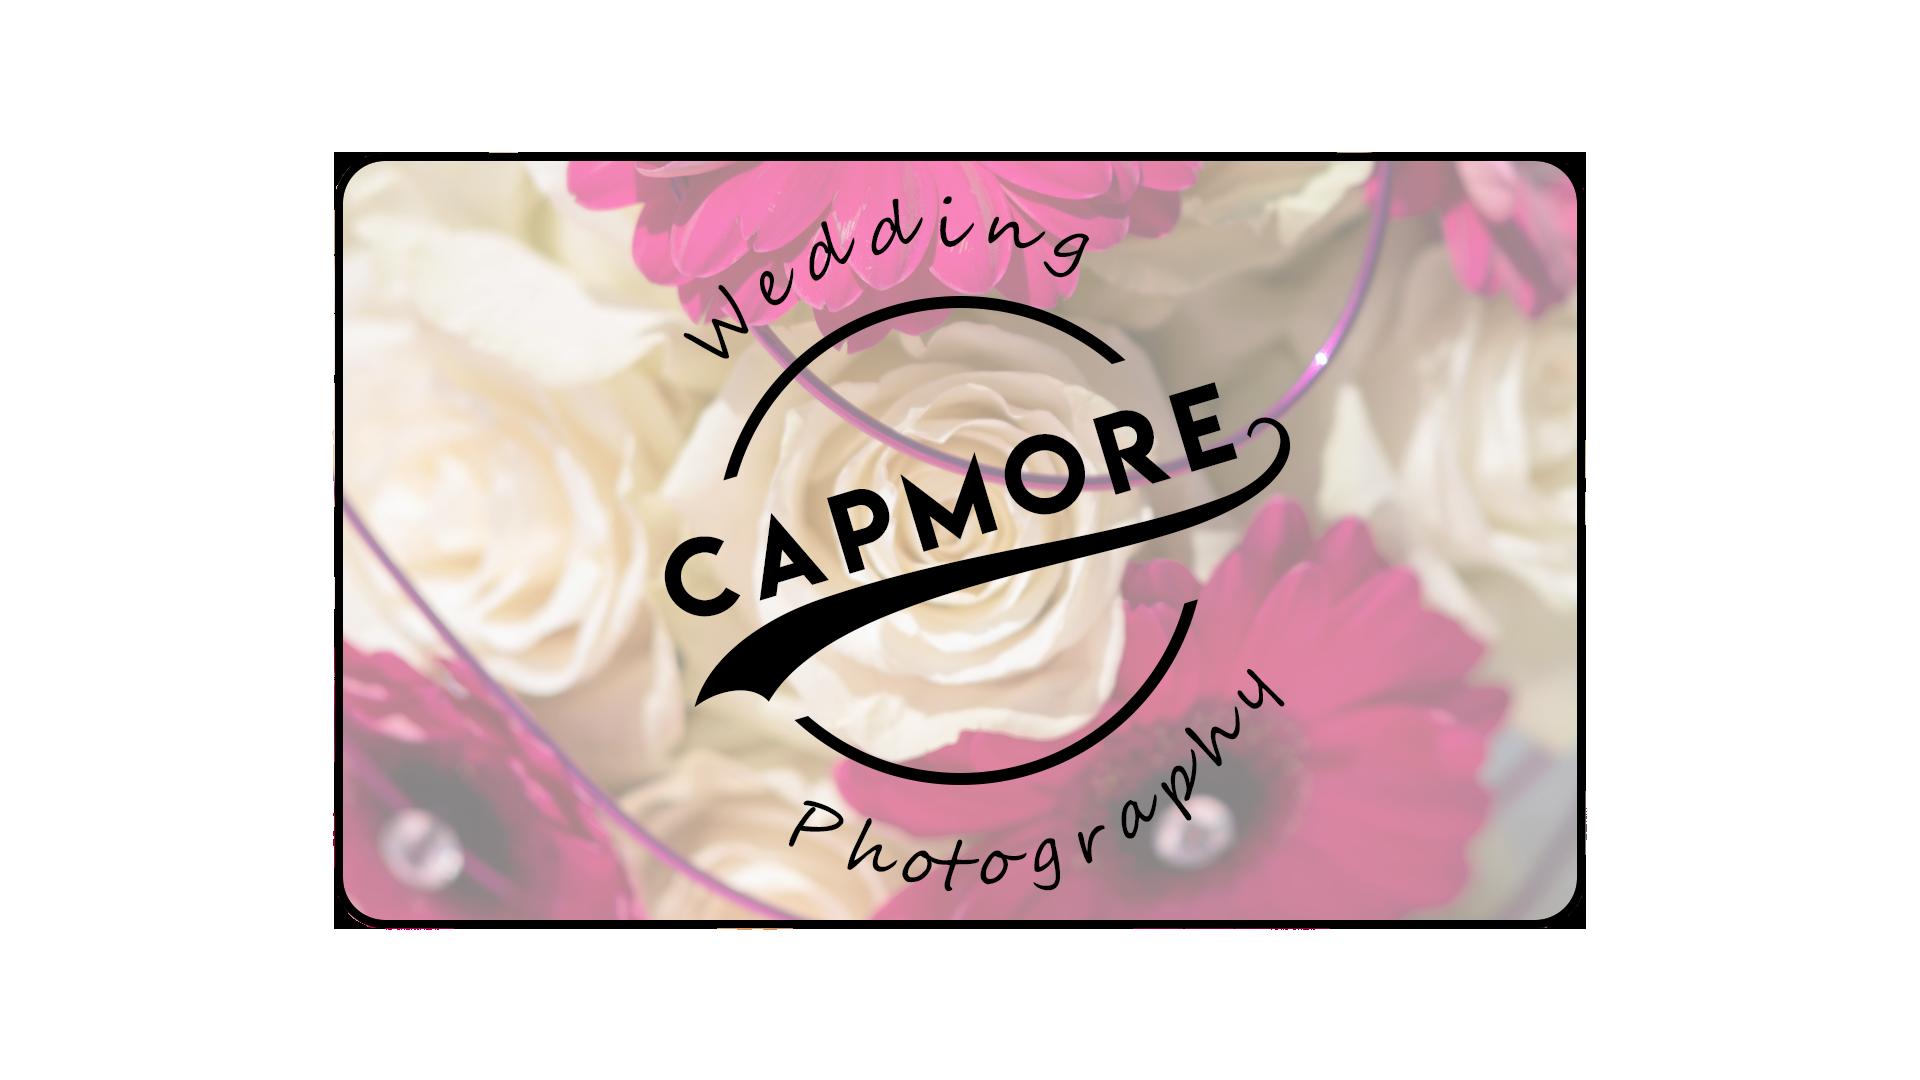 2019-10-06_Logo_Entwurf_Capmore Wedding_Rahmen_Transparent_Blumen